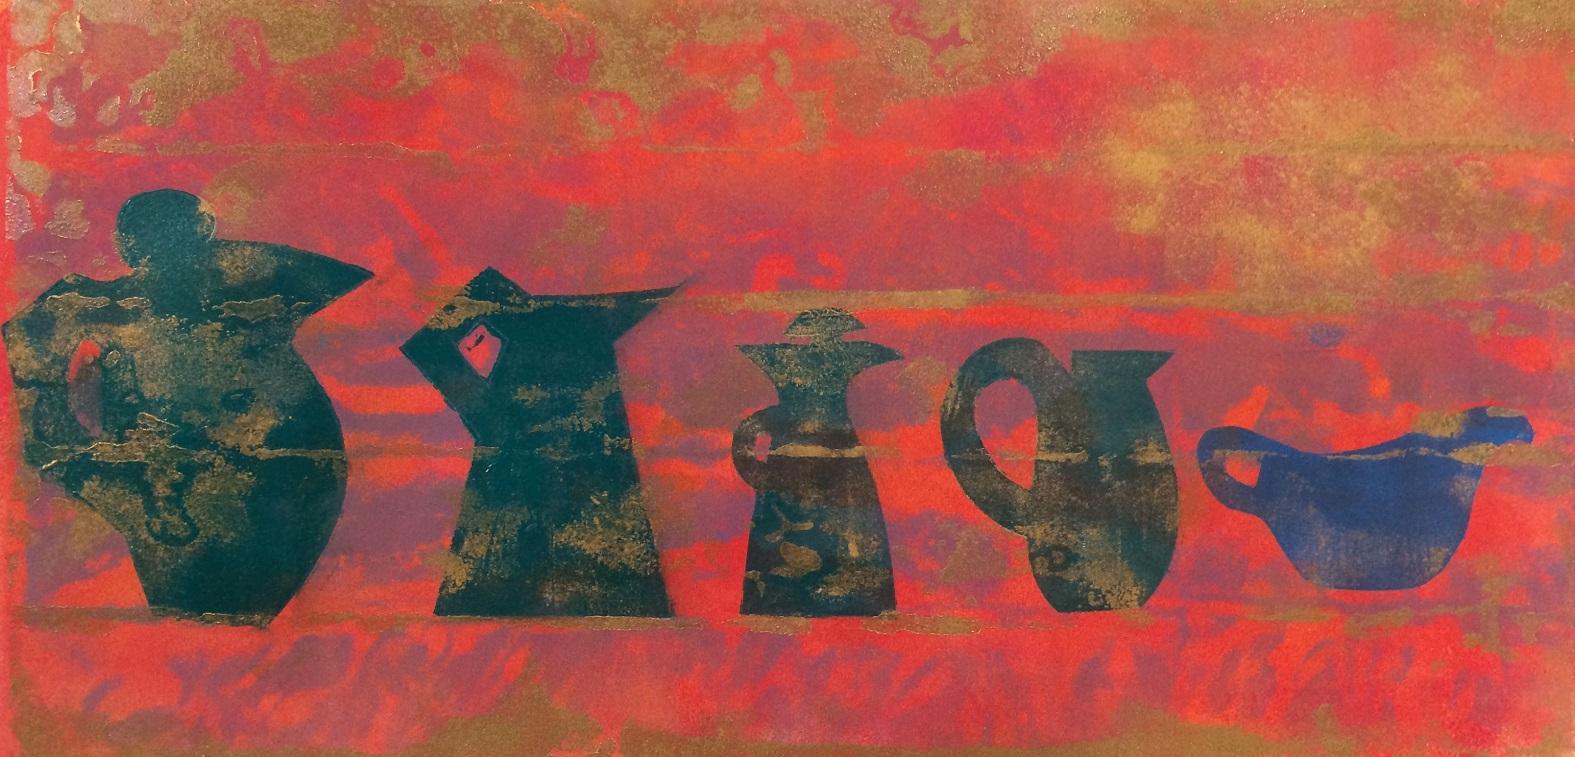 Artwork - Demi Monde Etched Lino & stencils Print   Jacki Baxter - Etched Lino & stencils